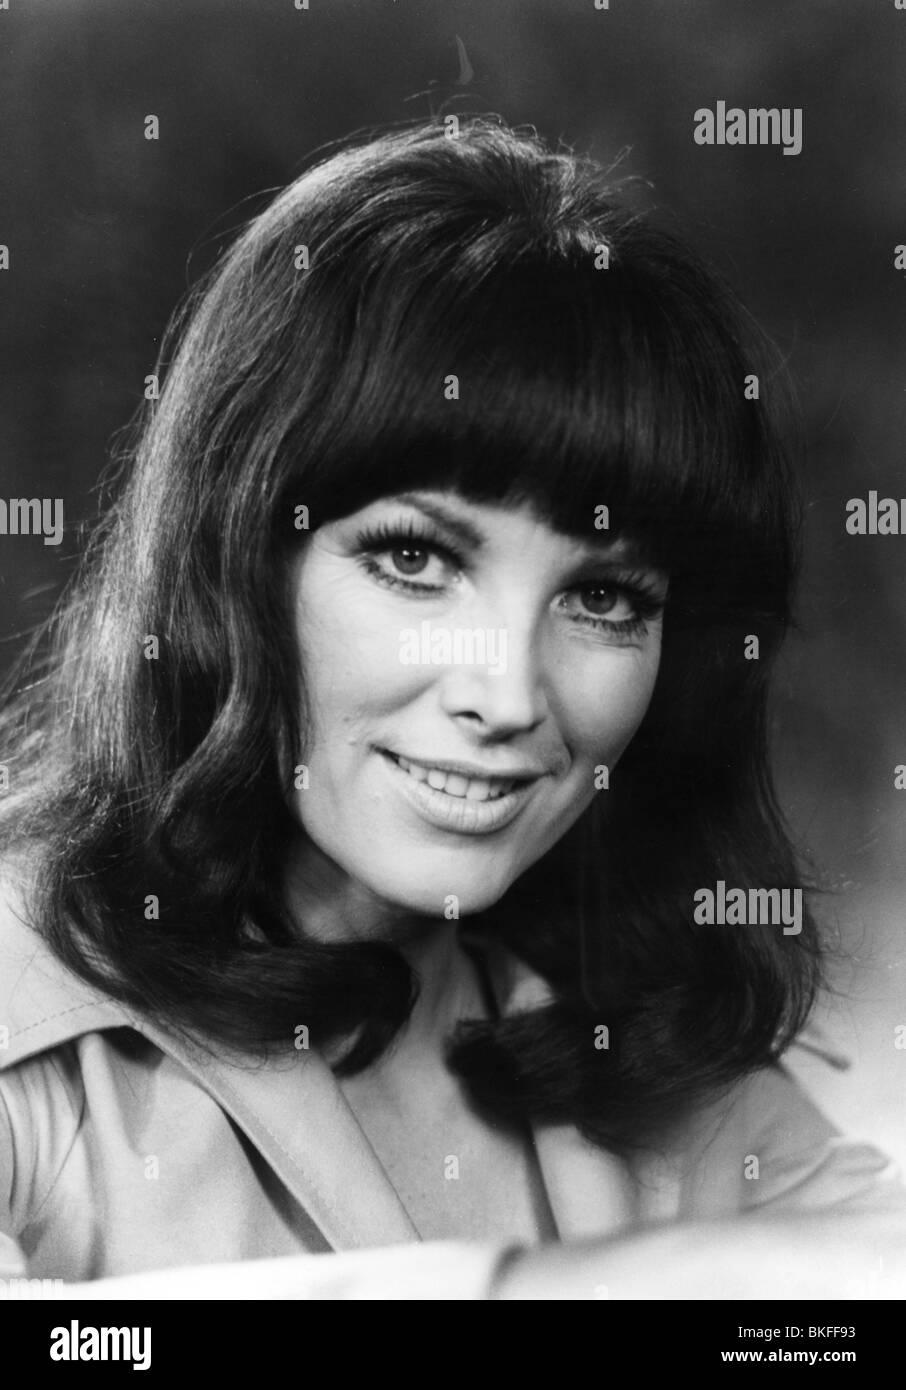 Schuermann, Petra, 15.9.1935 - 13.1.2010, German actress, TV presenter, portrait, 1.11.1982, Additional-Rights-Clearances - Stock Image